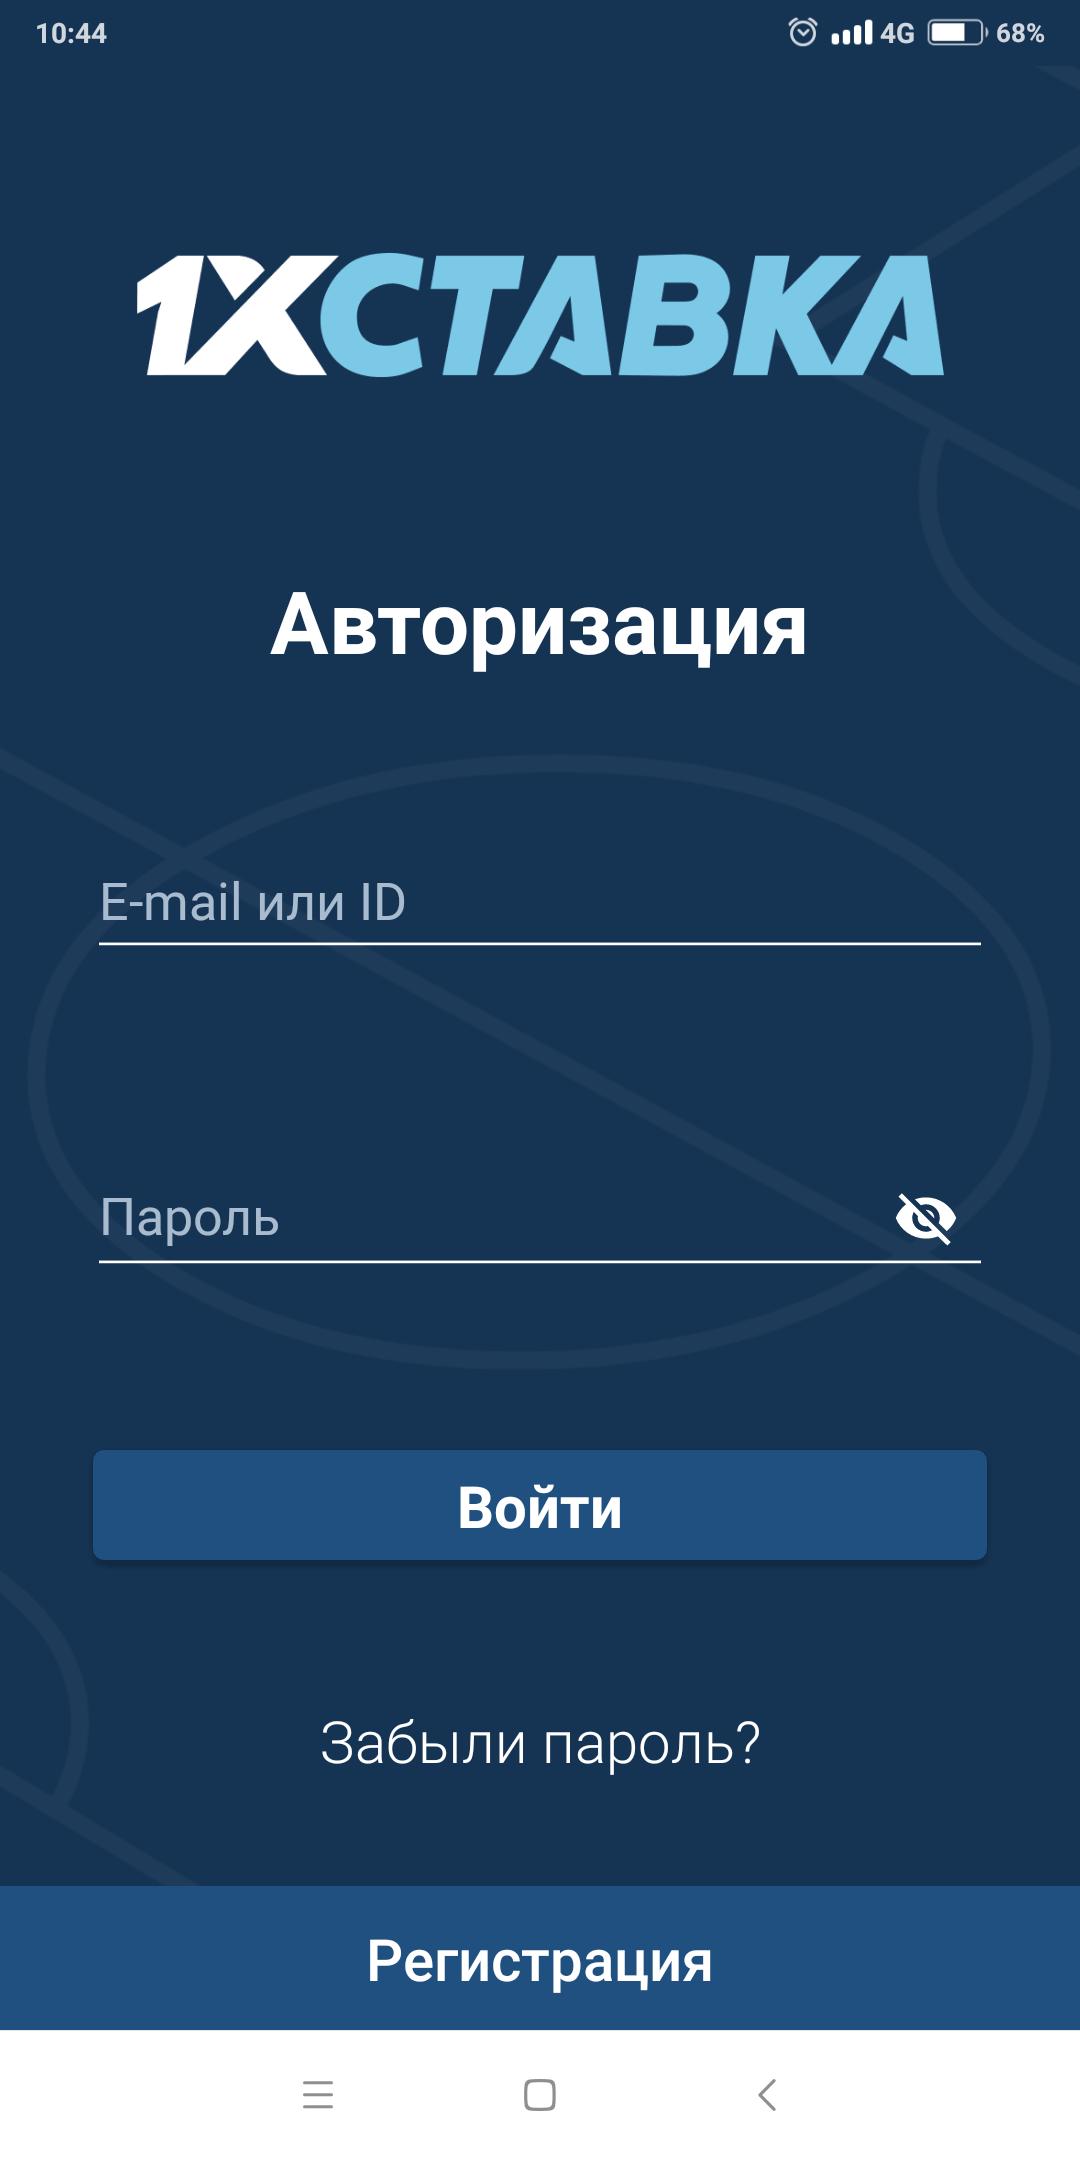 Промокод 1xbet на сегодня бесплатно 2019 при регистрации